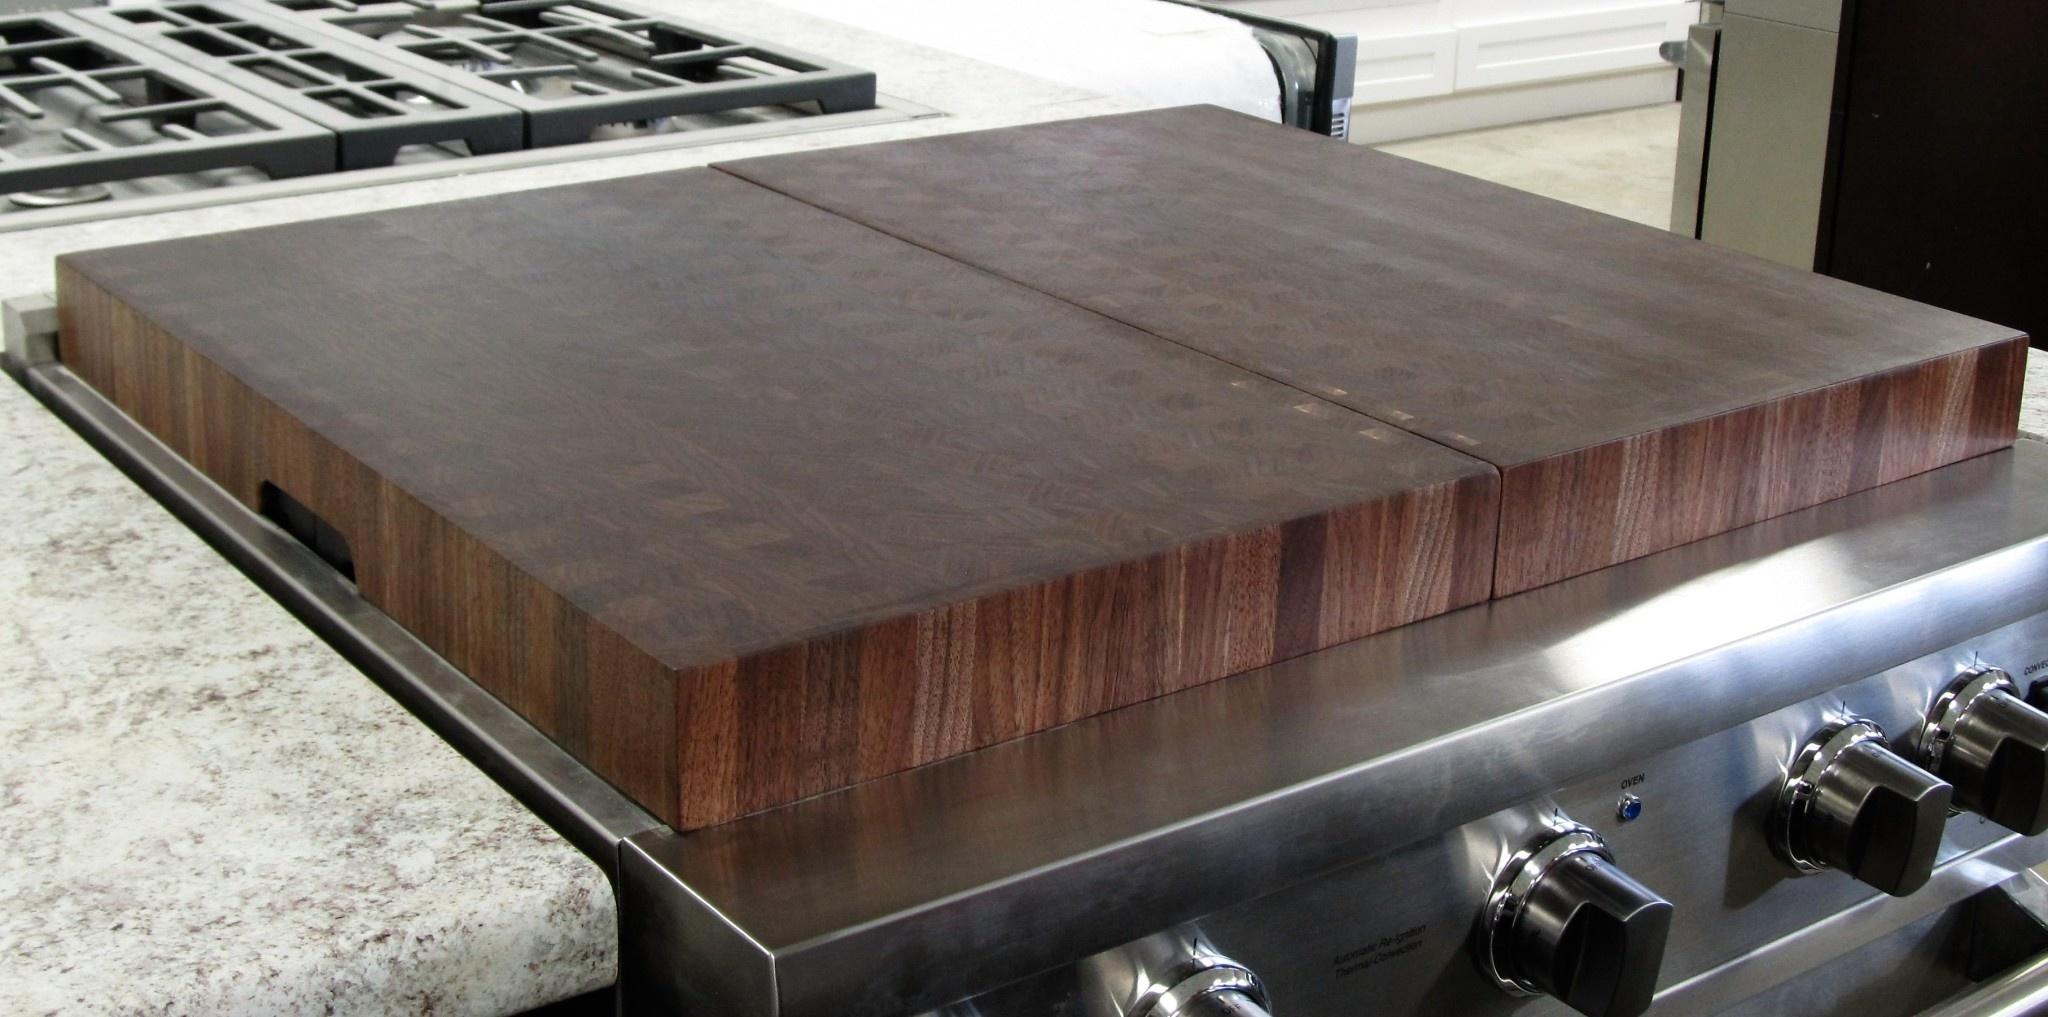 Richard Rose Culinary Custom Stove Top Covers 6 Burner